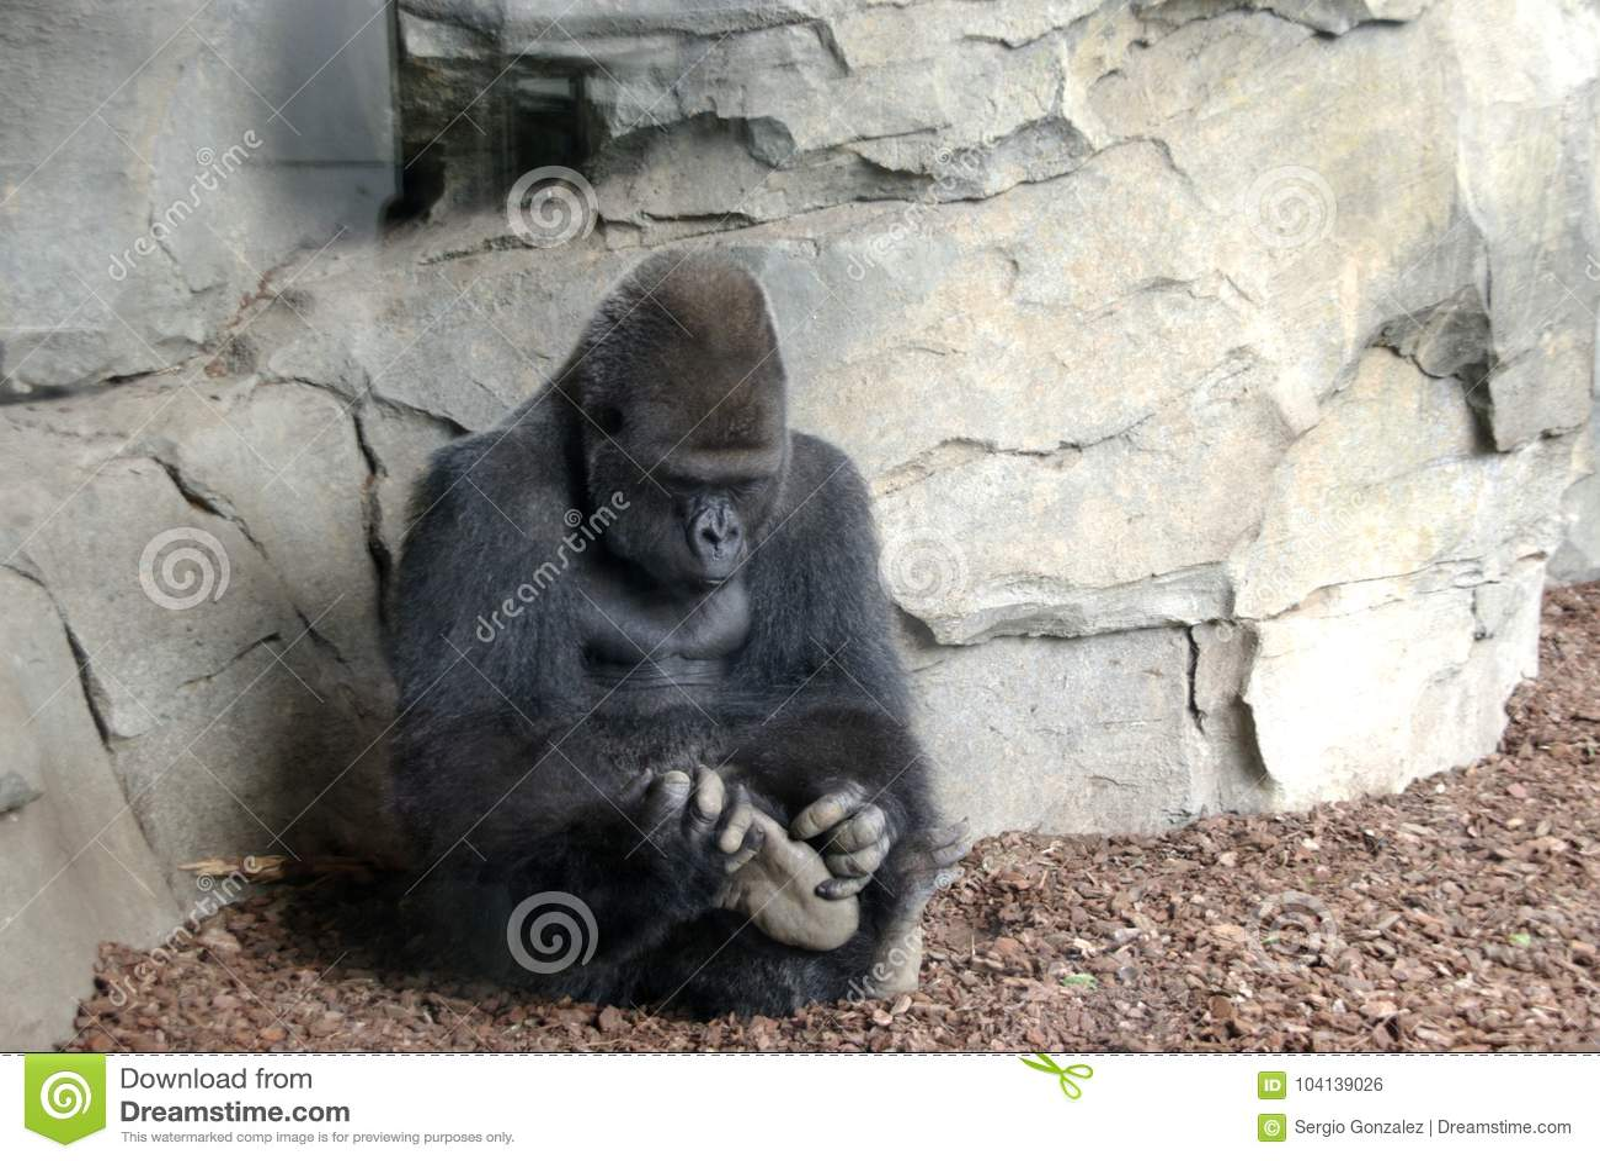 Gorilla macho